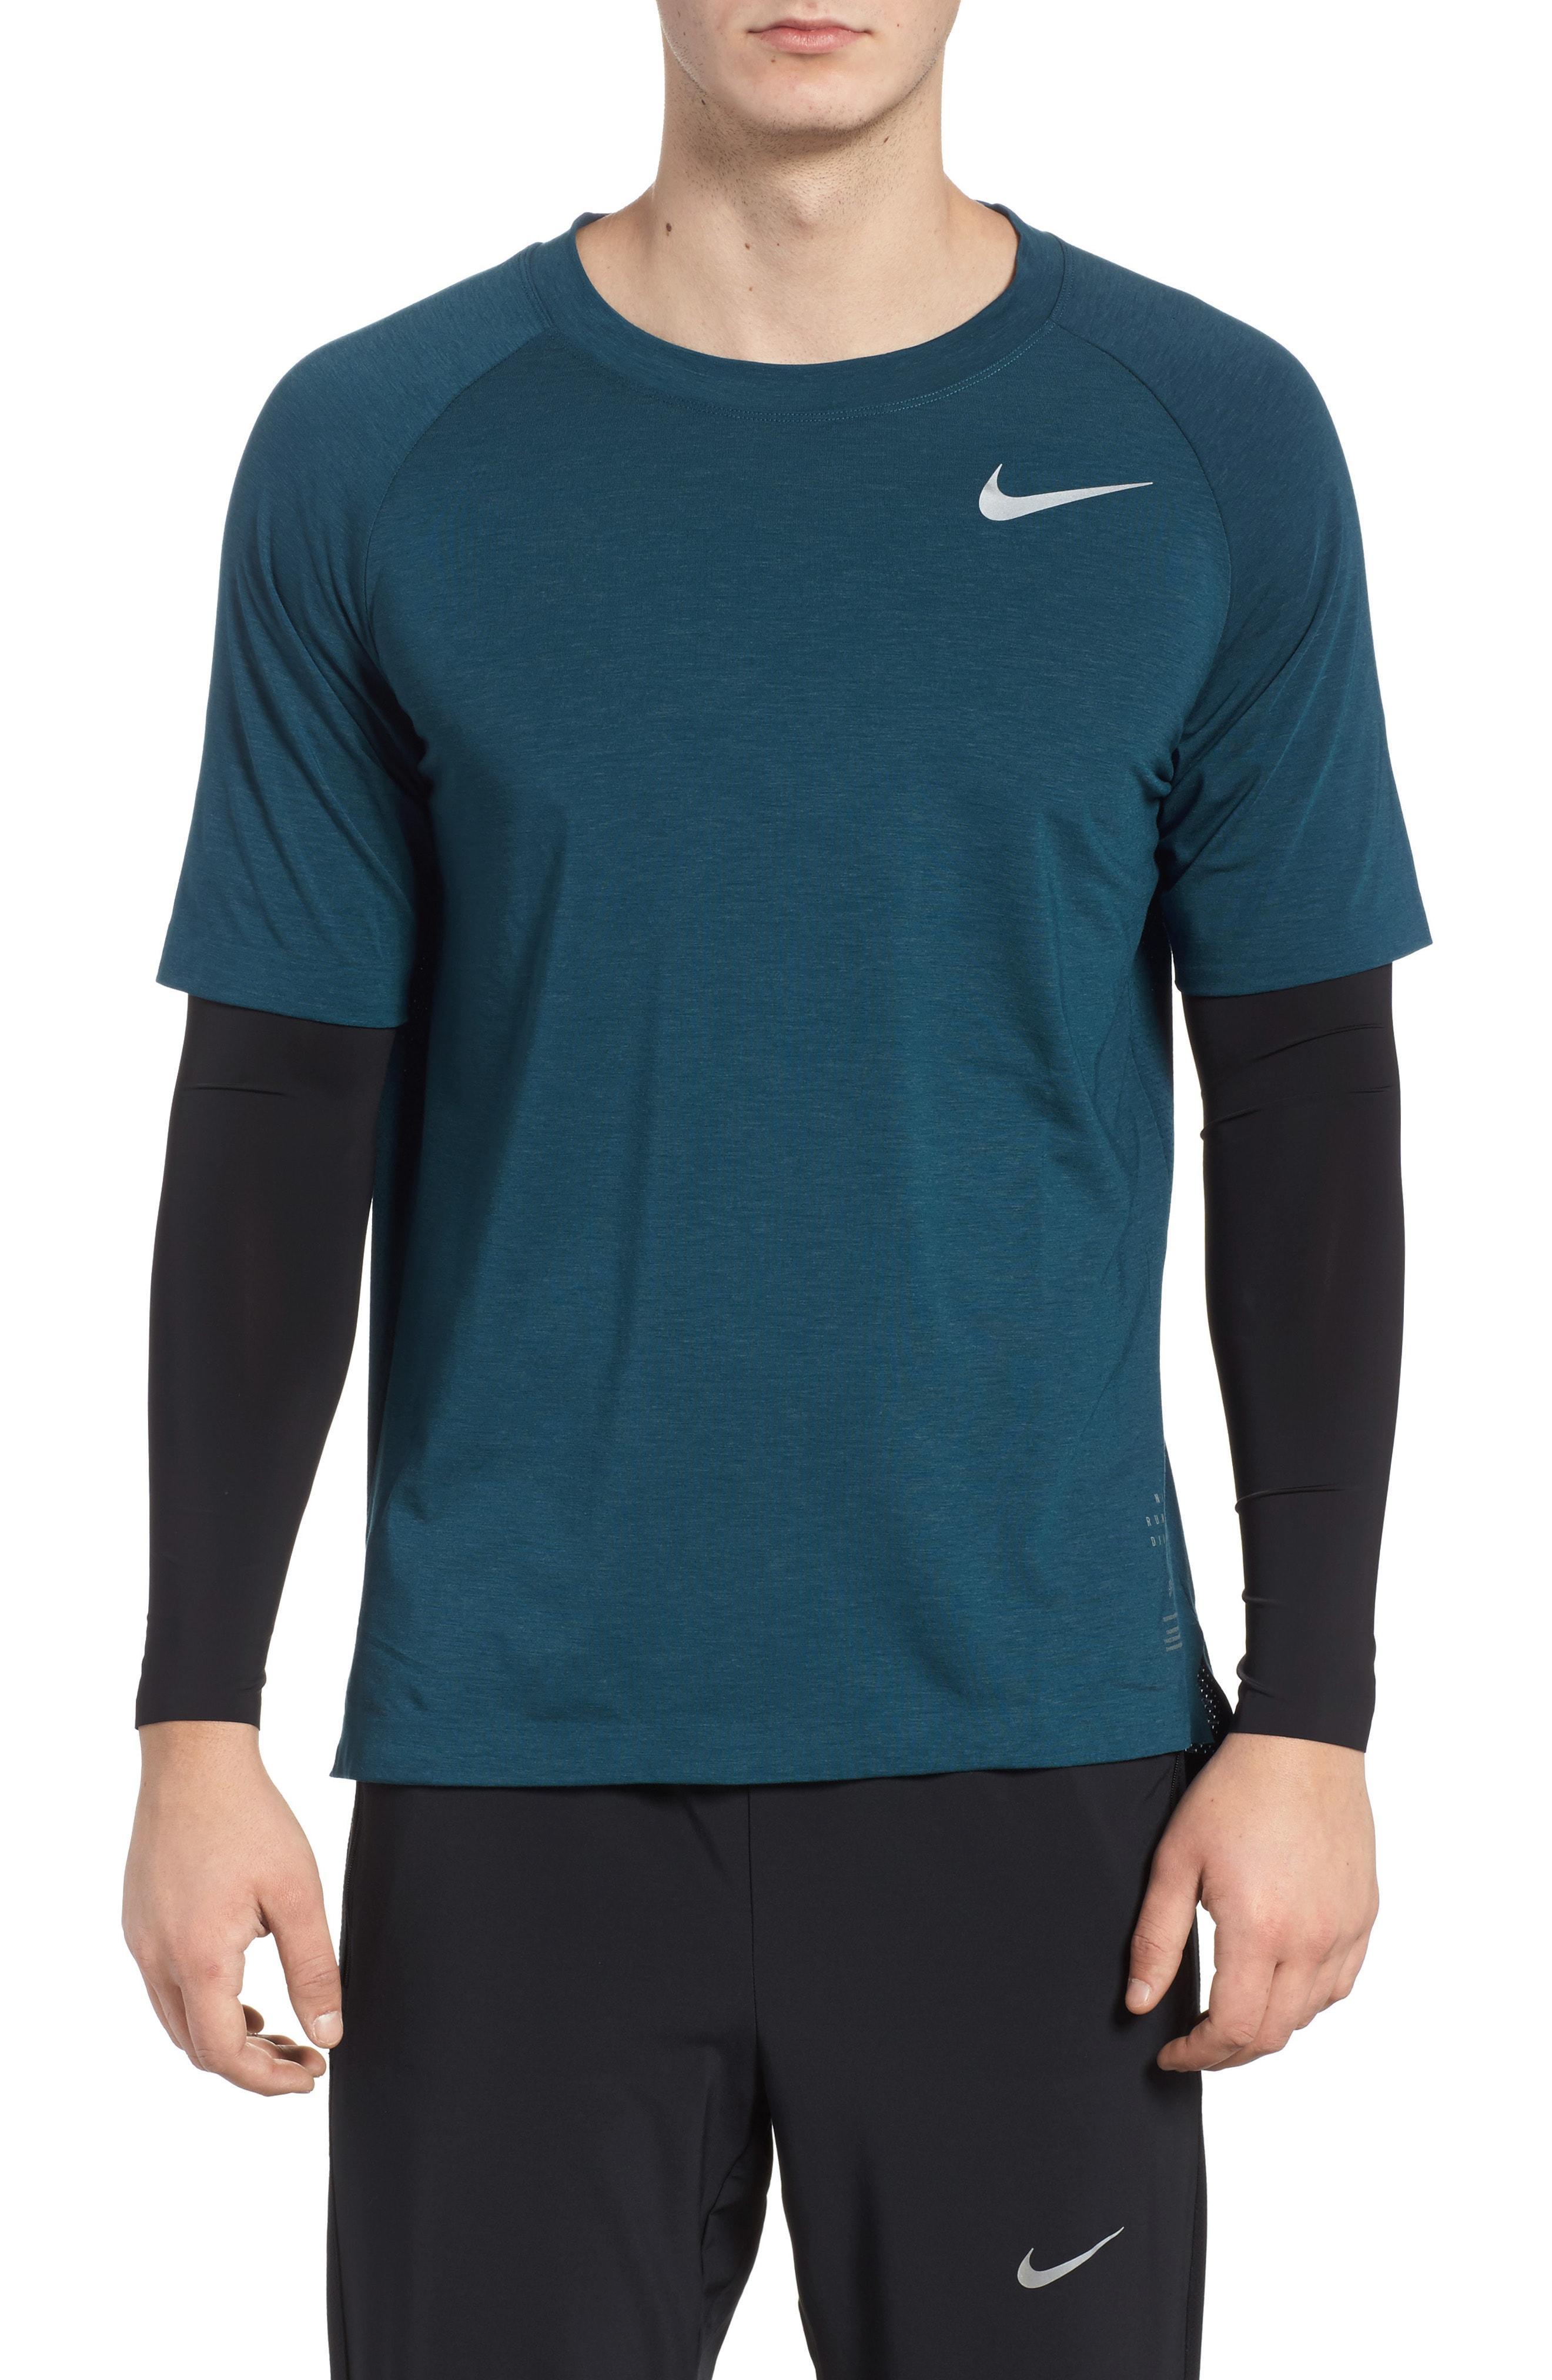 Escalera De Dios ganso  Nike Run Division Dry Layered Long Sleeve T-shirt In Blue Force/ Heather |  ModeSens